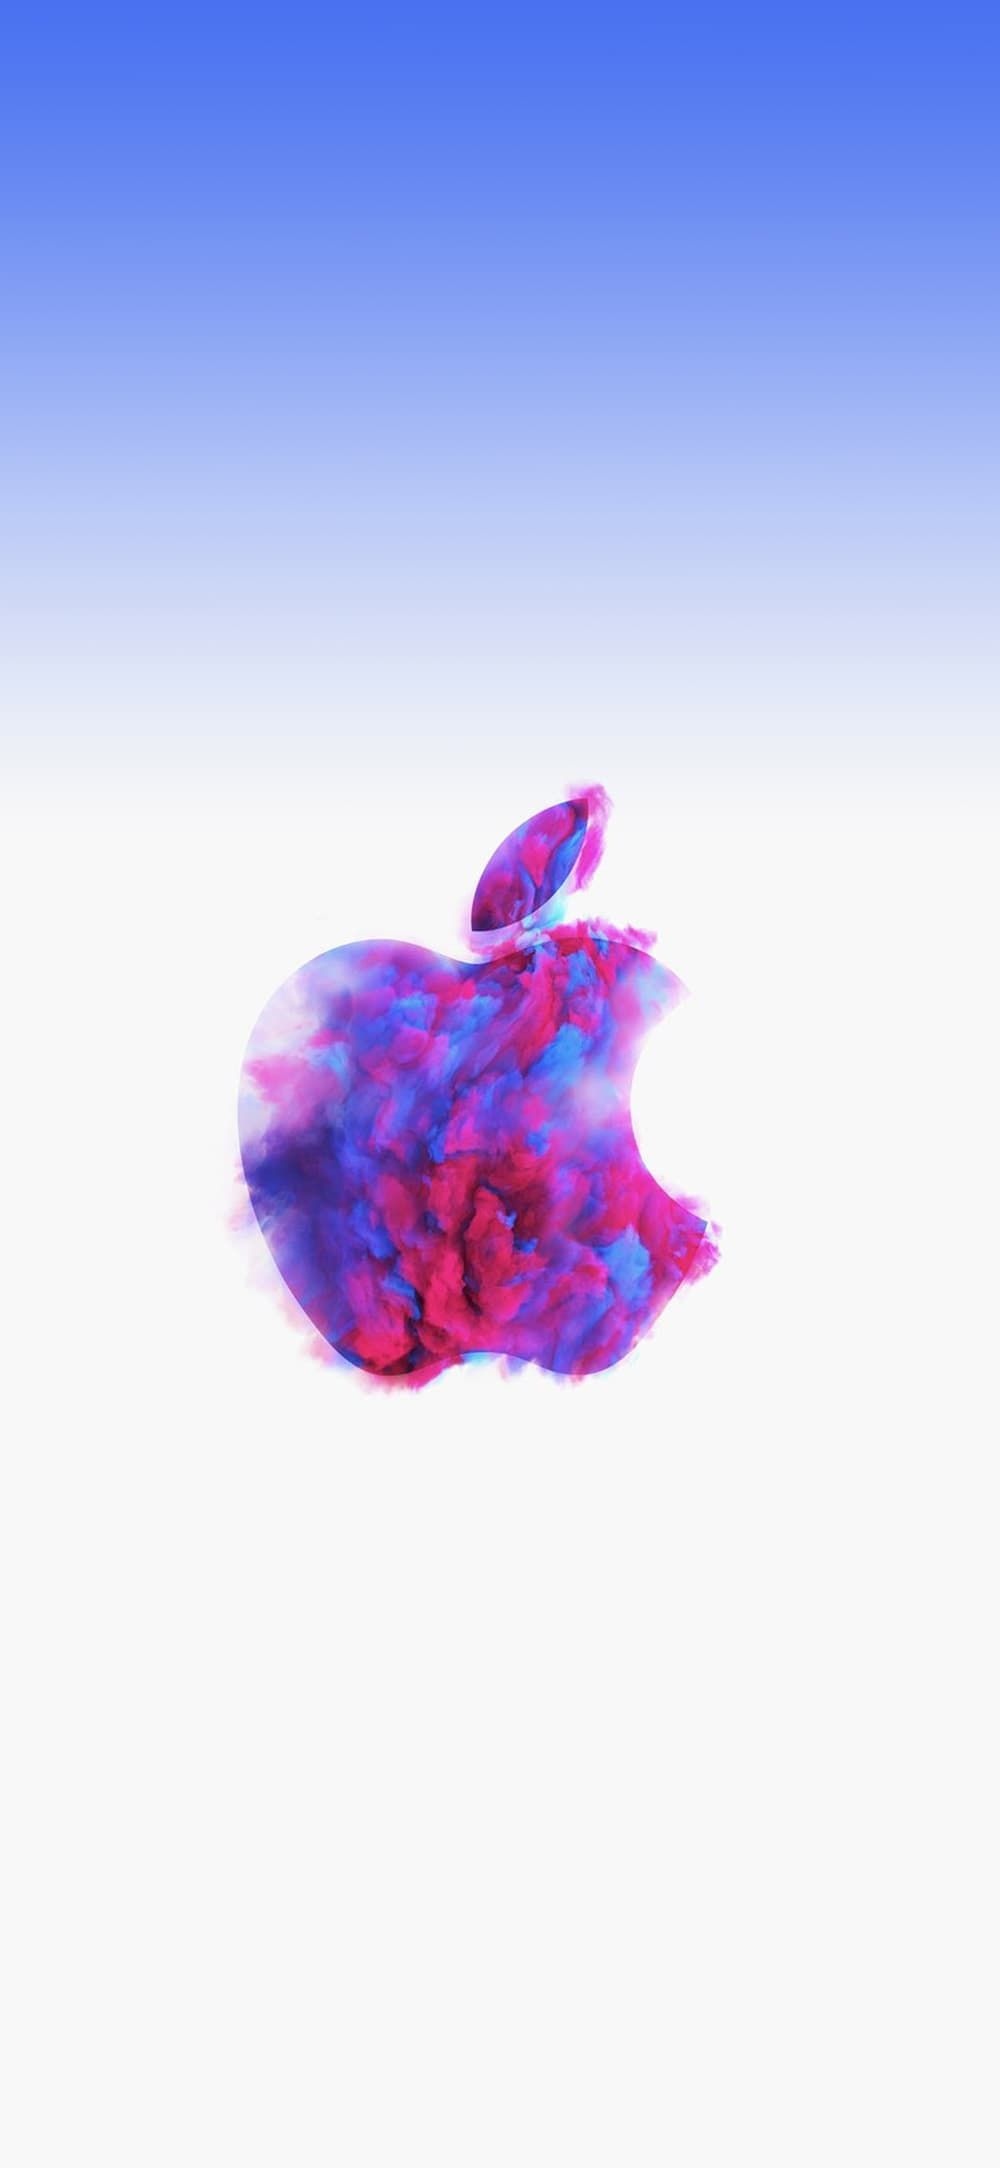 خلفيات ايفون 11 Apple Wallpaper Apple Wallpaper Iphone Iphone Wallpaper